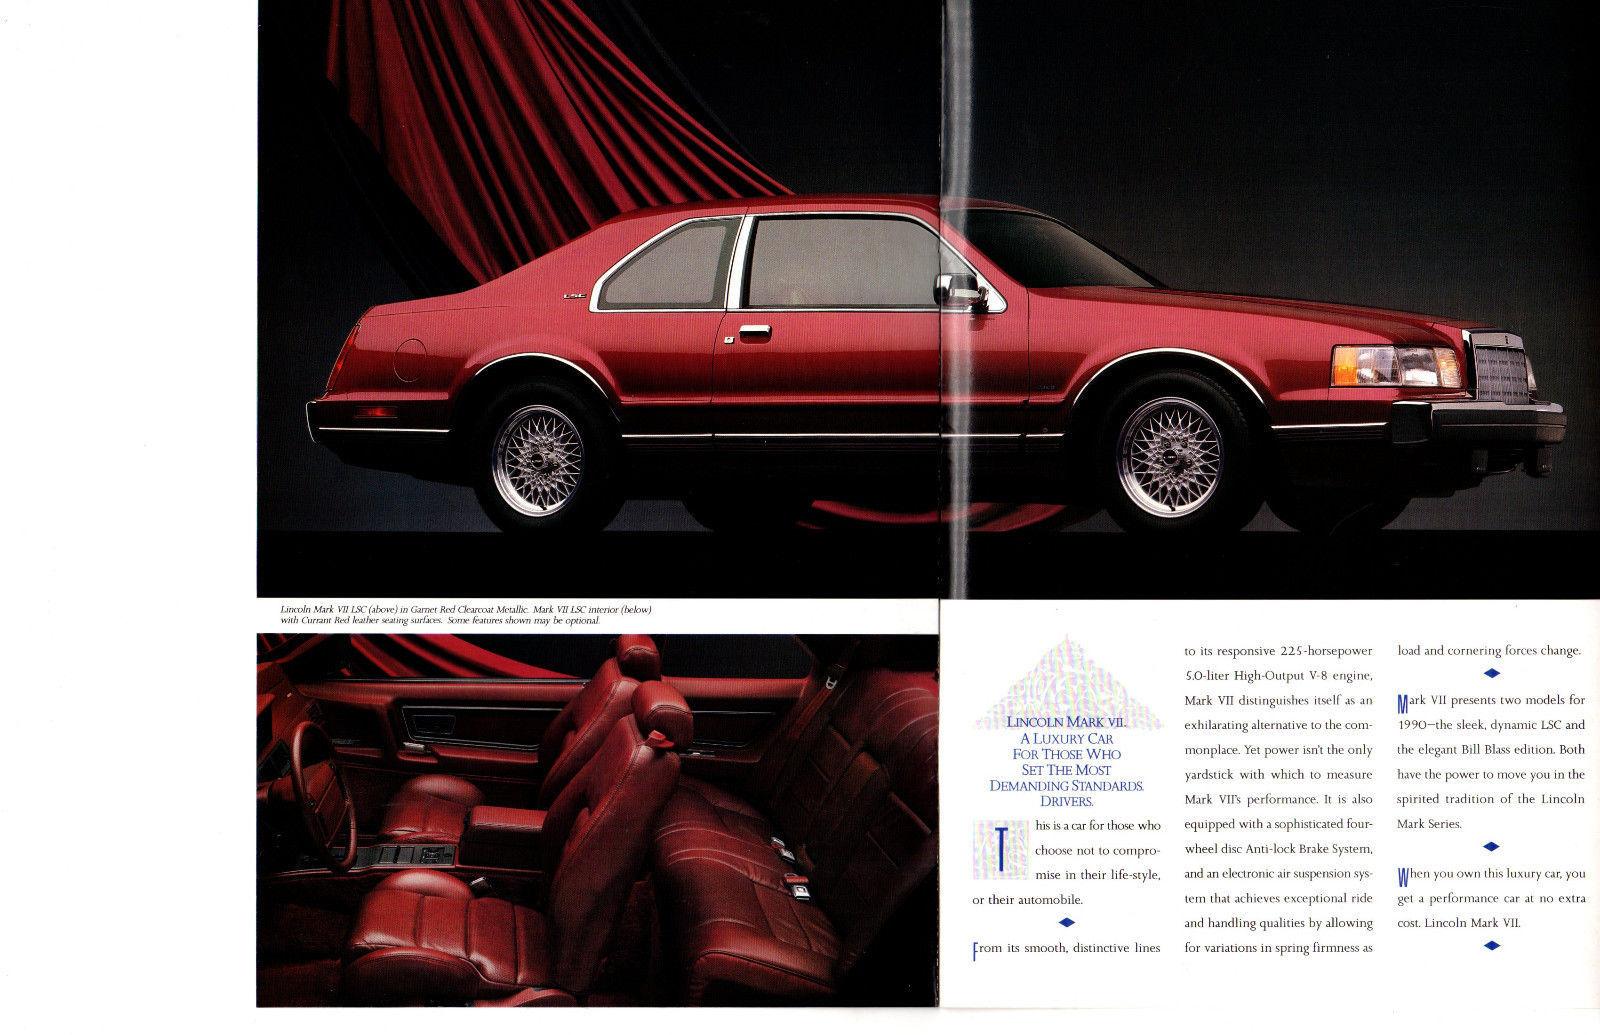 1990 Lincoln Mark VII Bill Blass /& LSC Deluxe Dealer Sales Brochure